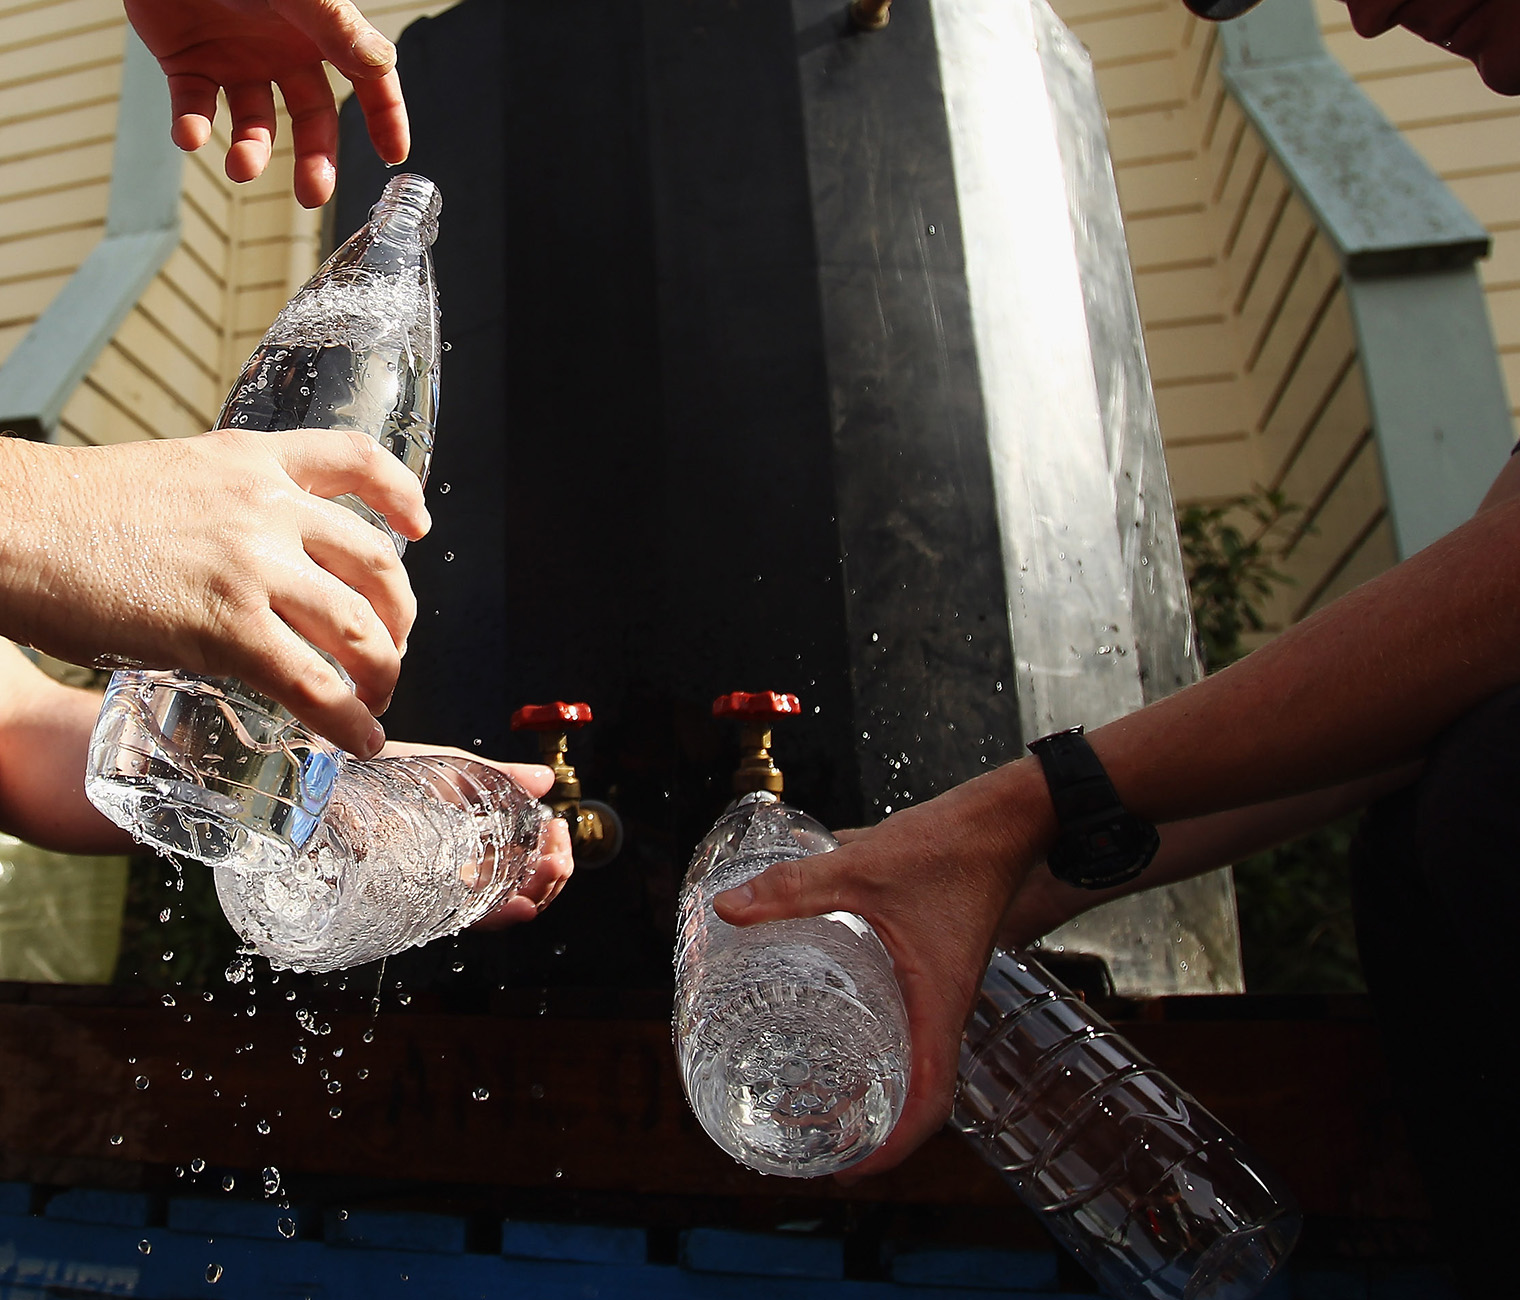 perierga.gr - Τα μπουκάλια νερού είναι πιo βρόμικα από... τη λεκάνη μιας τουαλέτας!